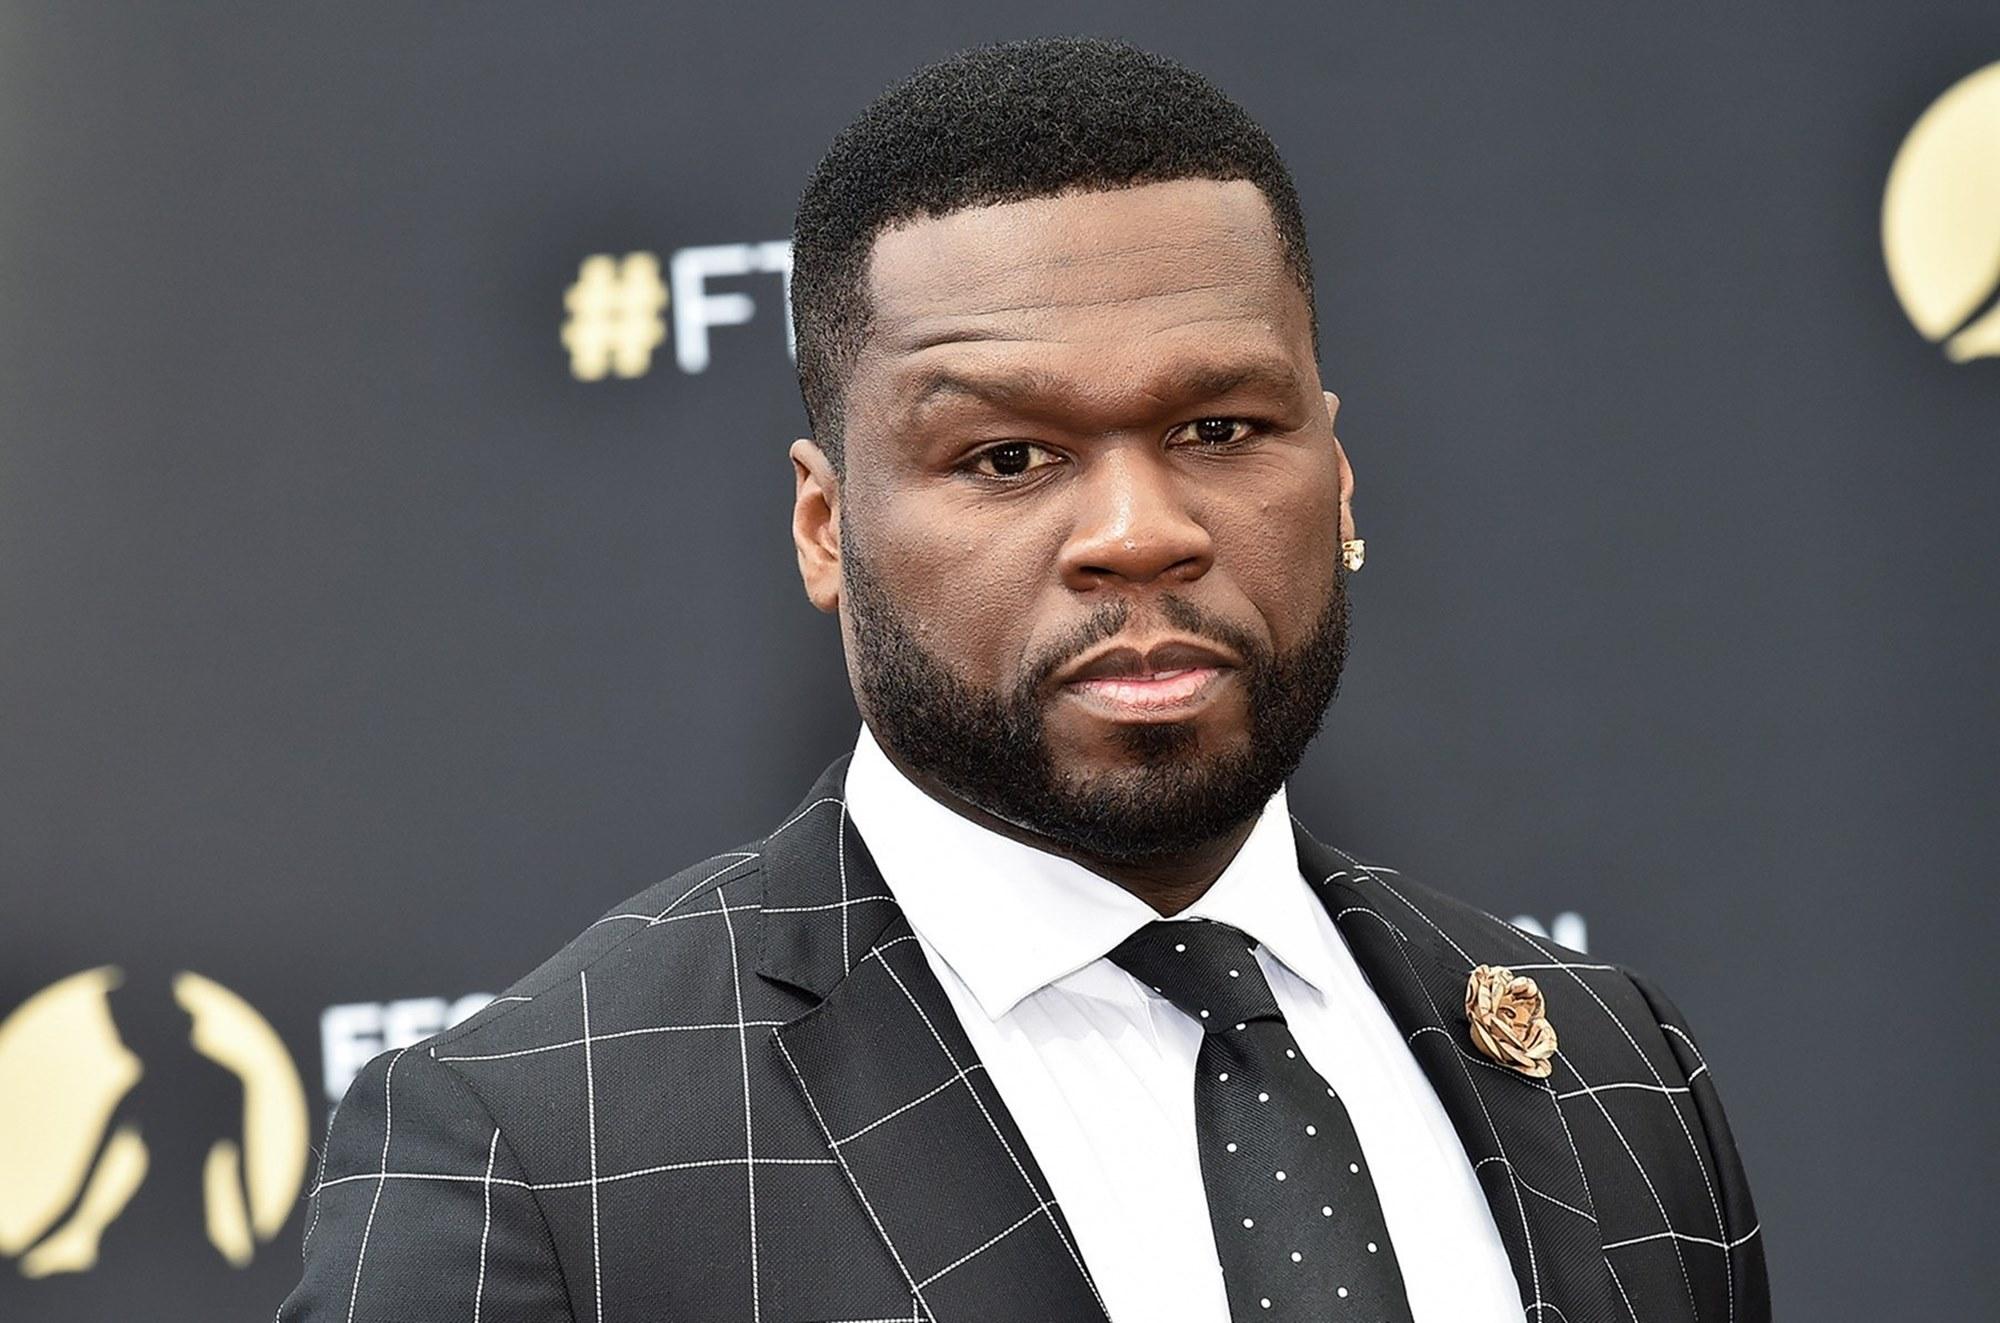 50 Cent Son Marquise Jackson Sir Tekashi 6ix9ine Power